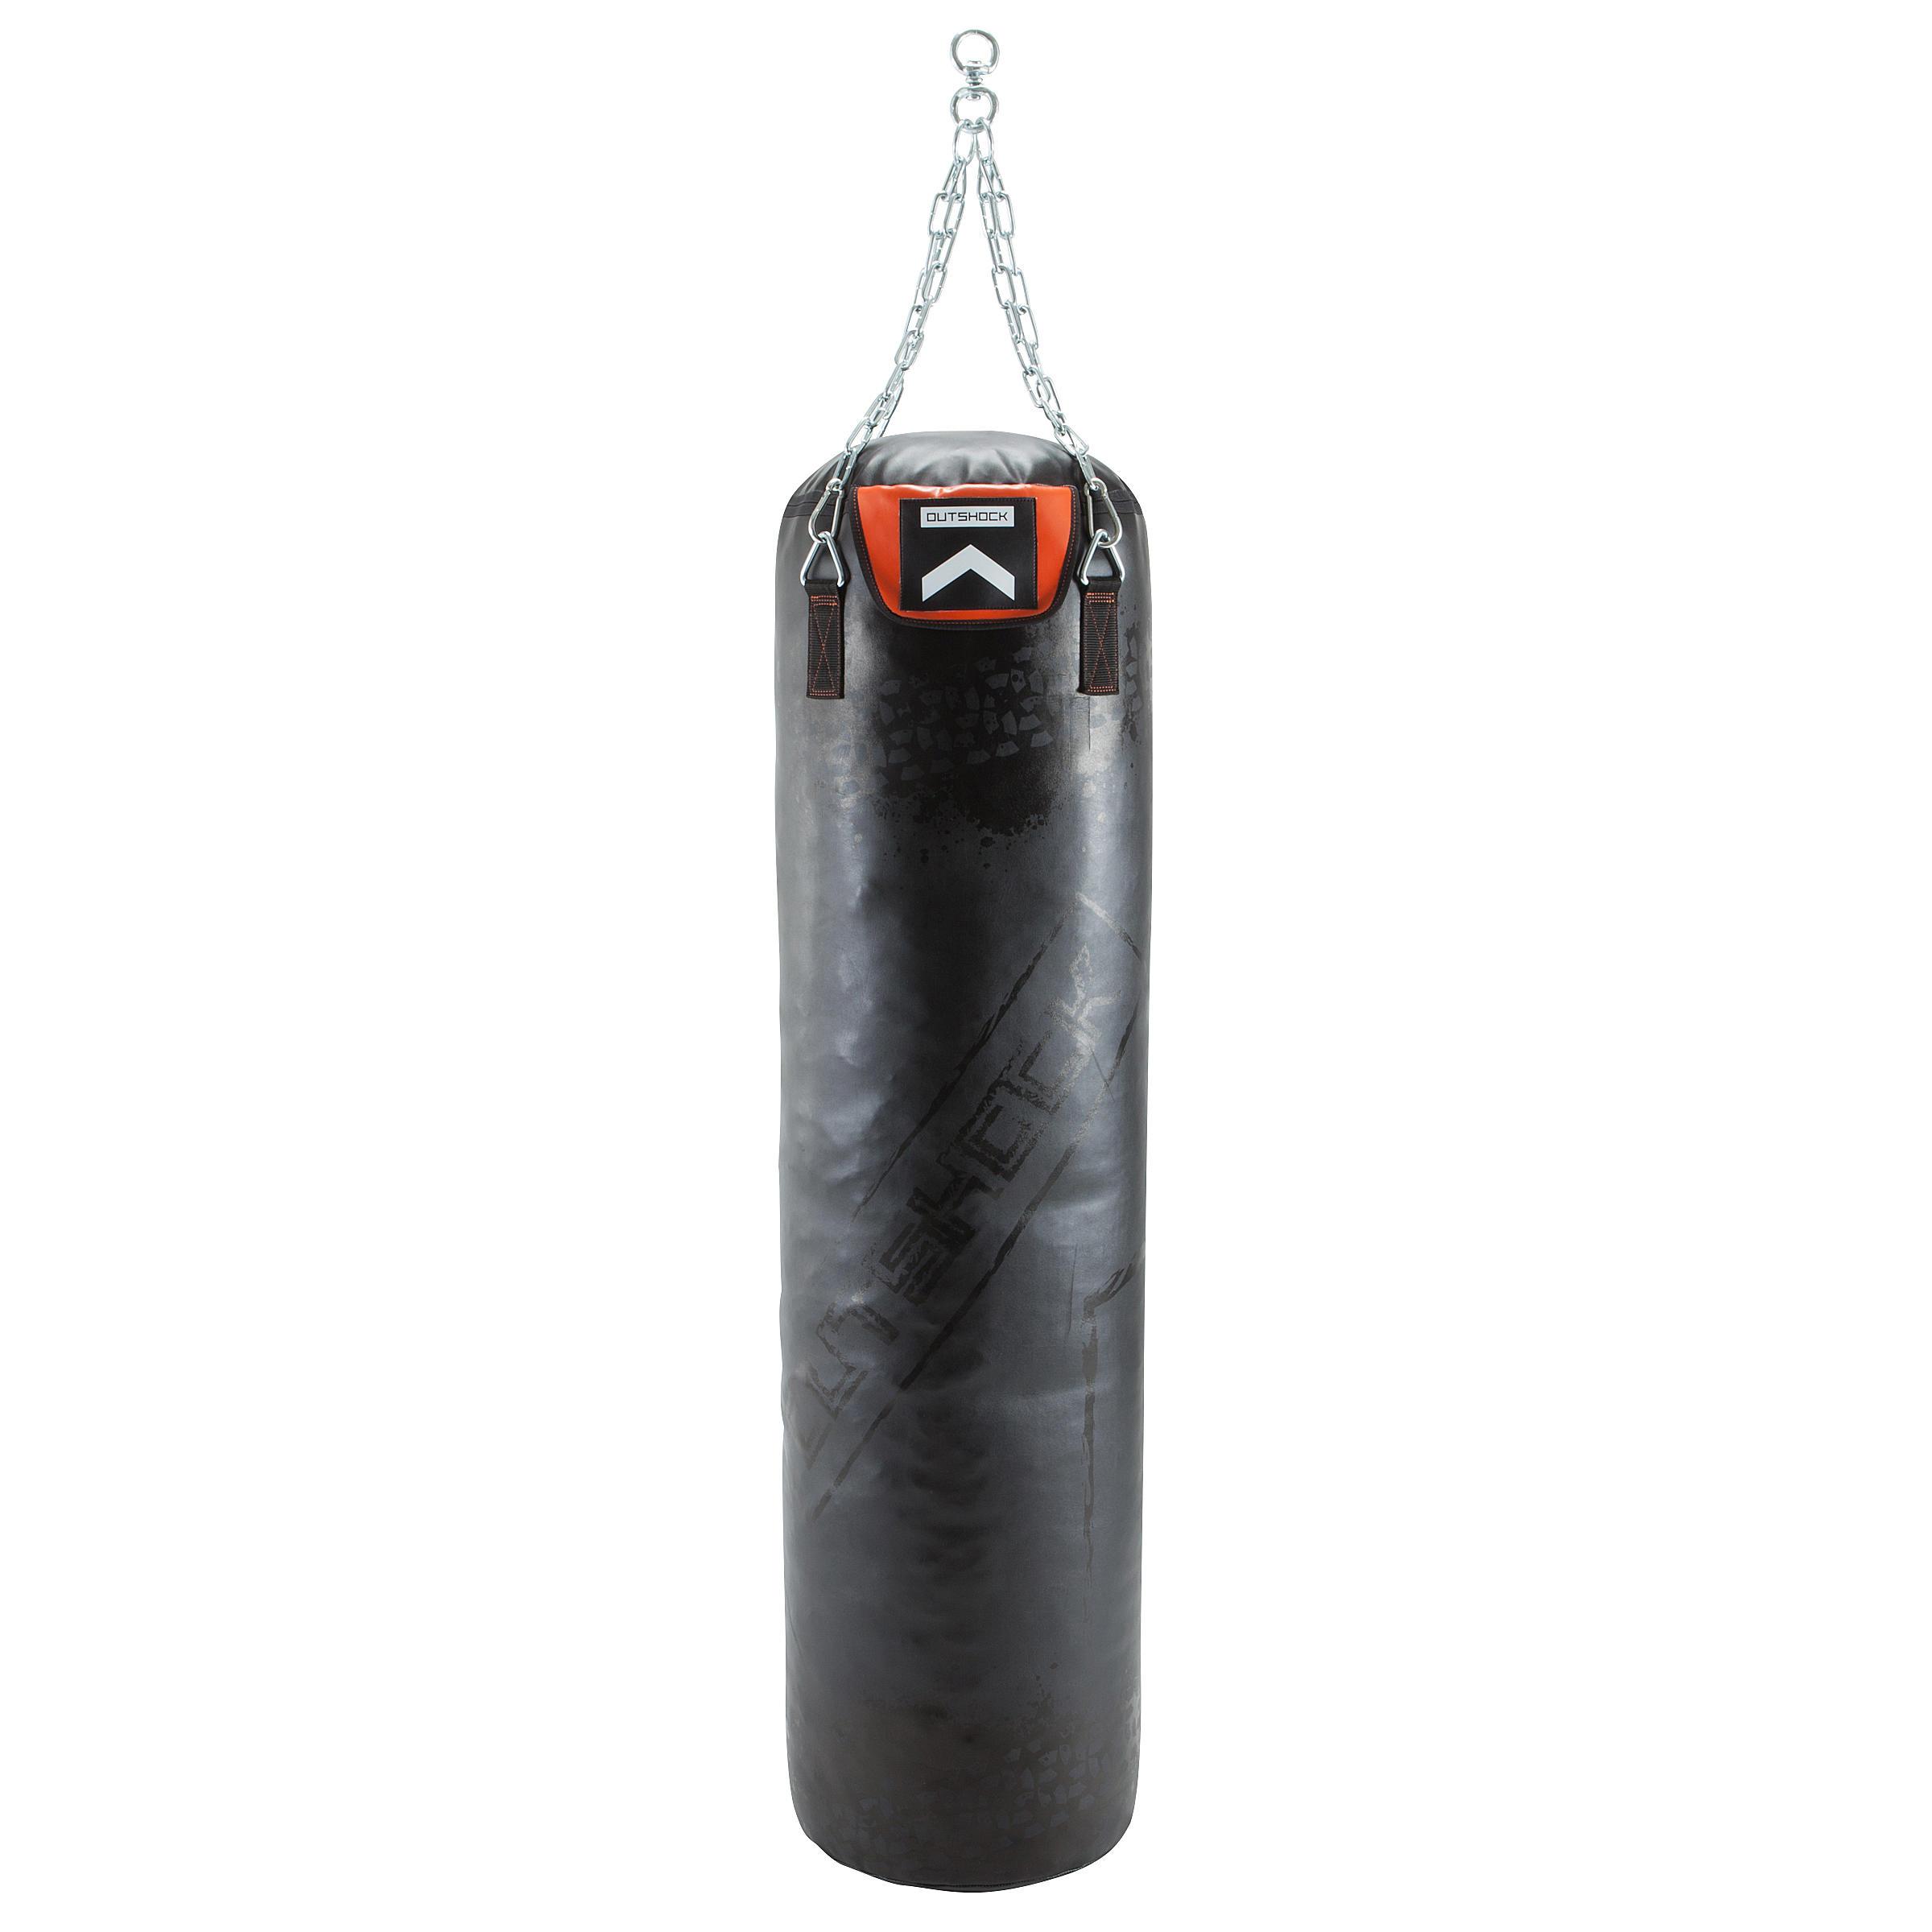 PB 1200 Punch Bag - Black